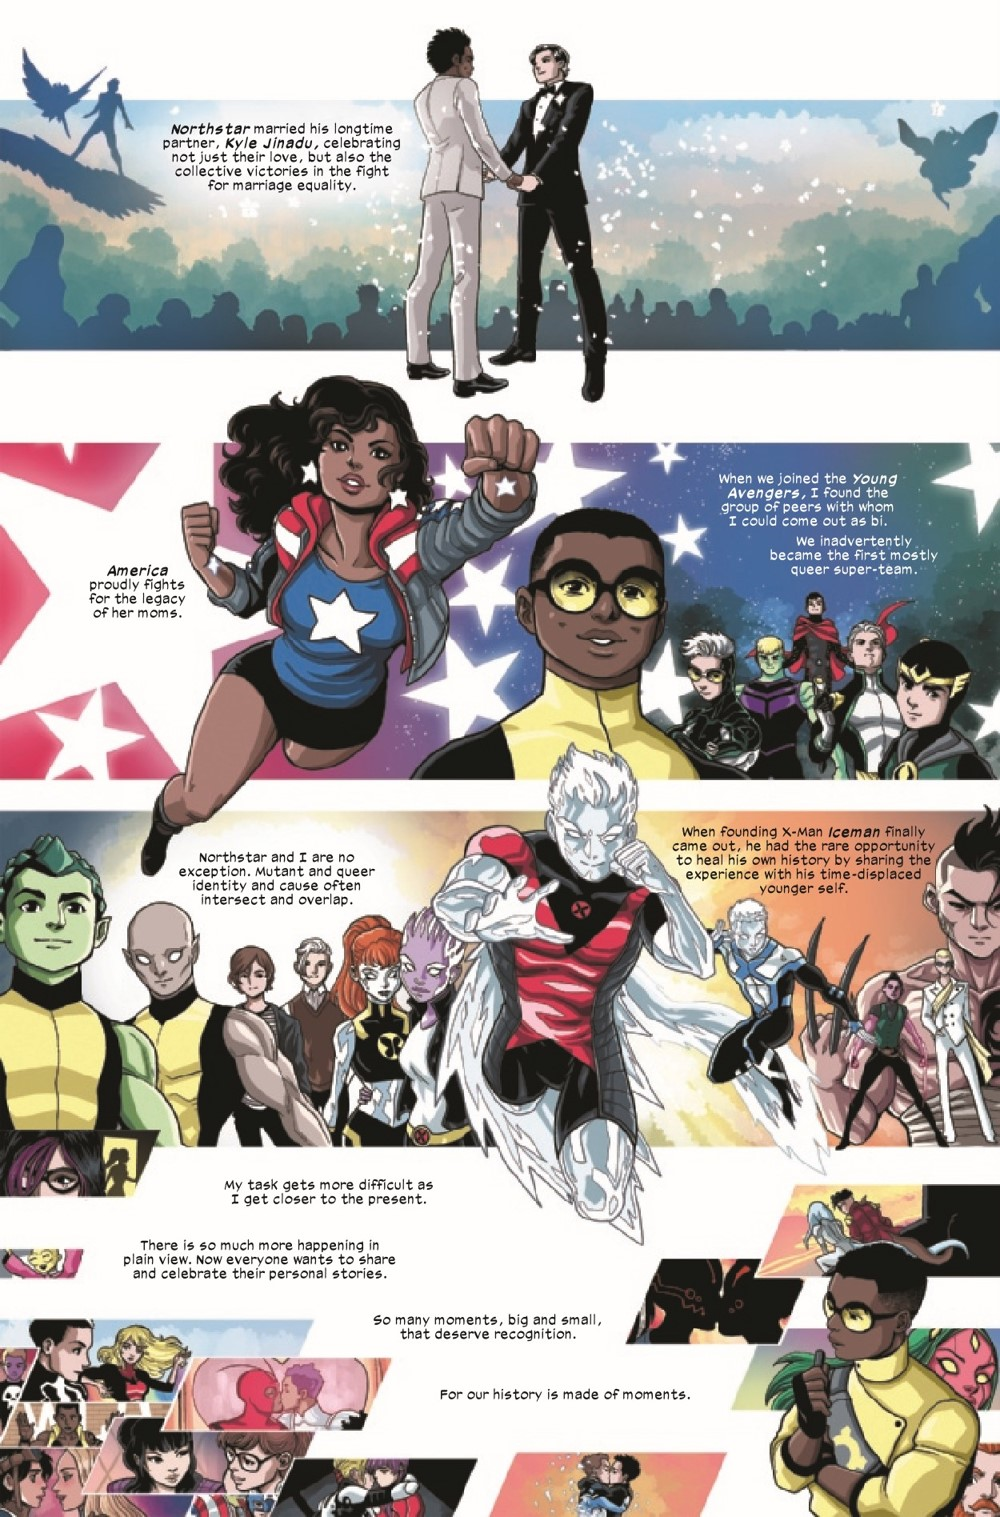 MARVOICESPRIDE2021001_Preview-06 ComicList Previews: MARVEL'S VOICES PRIDE #1